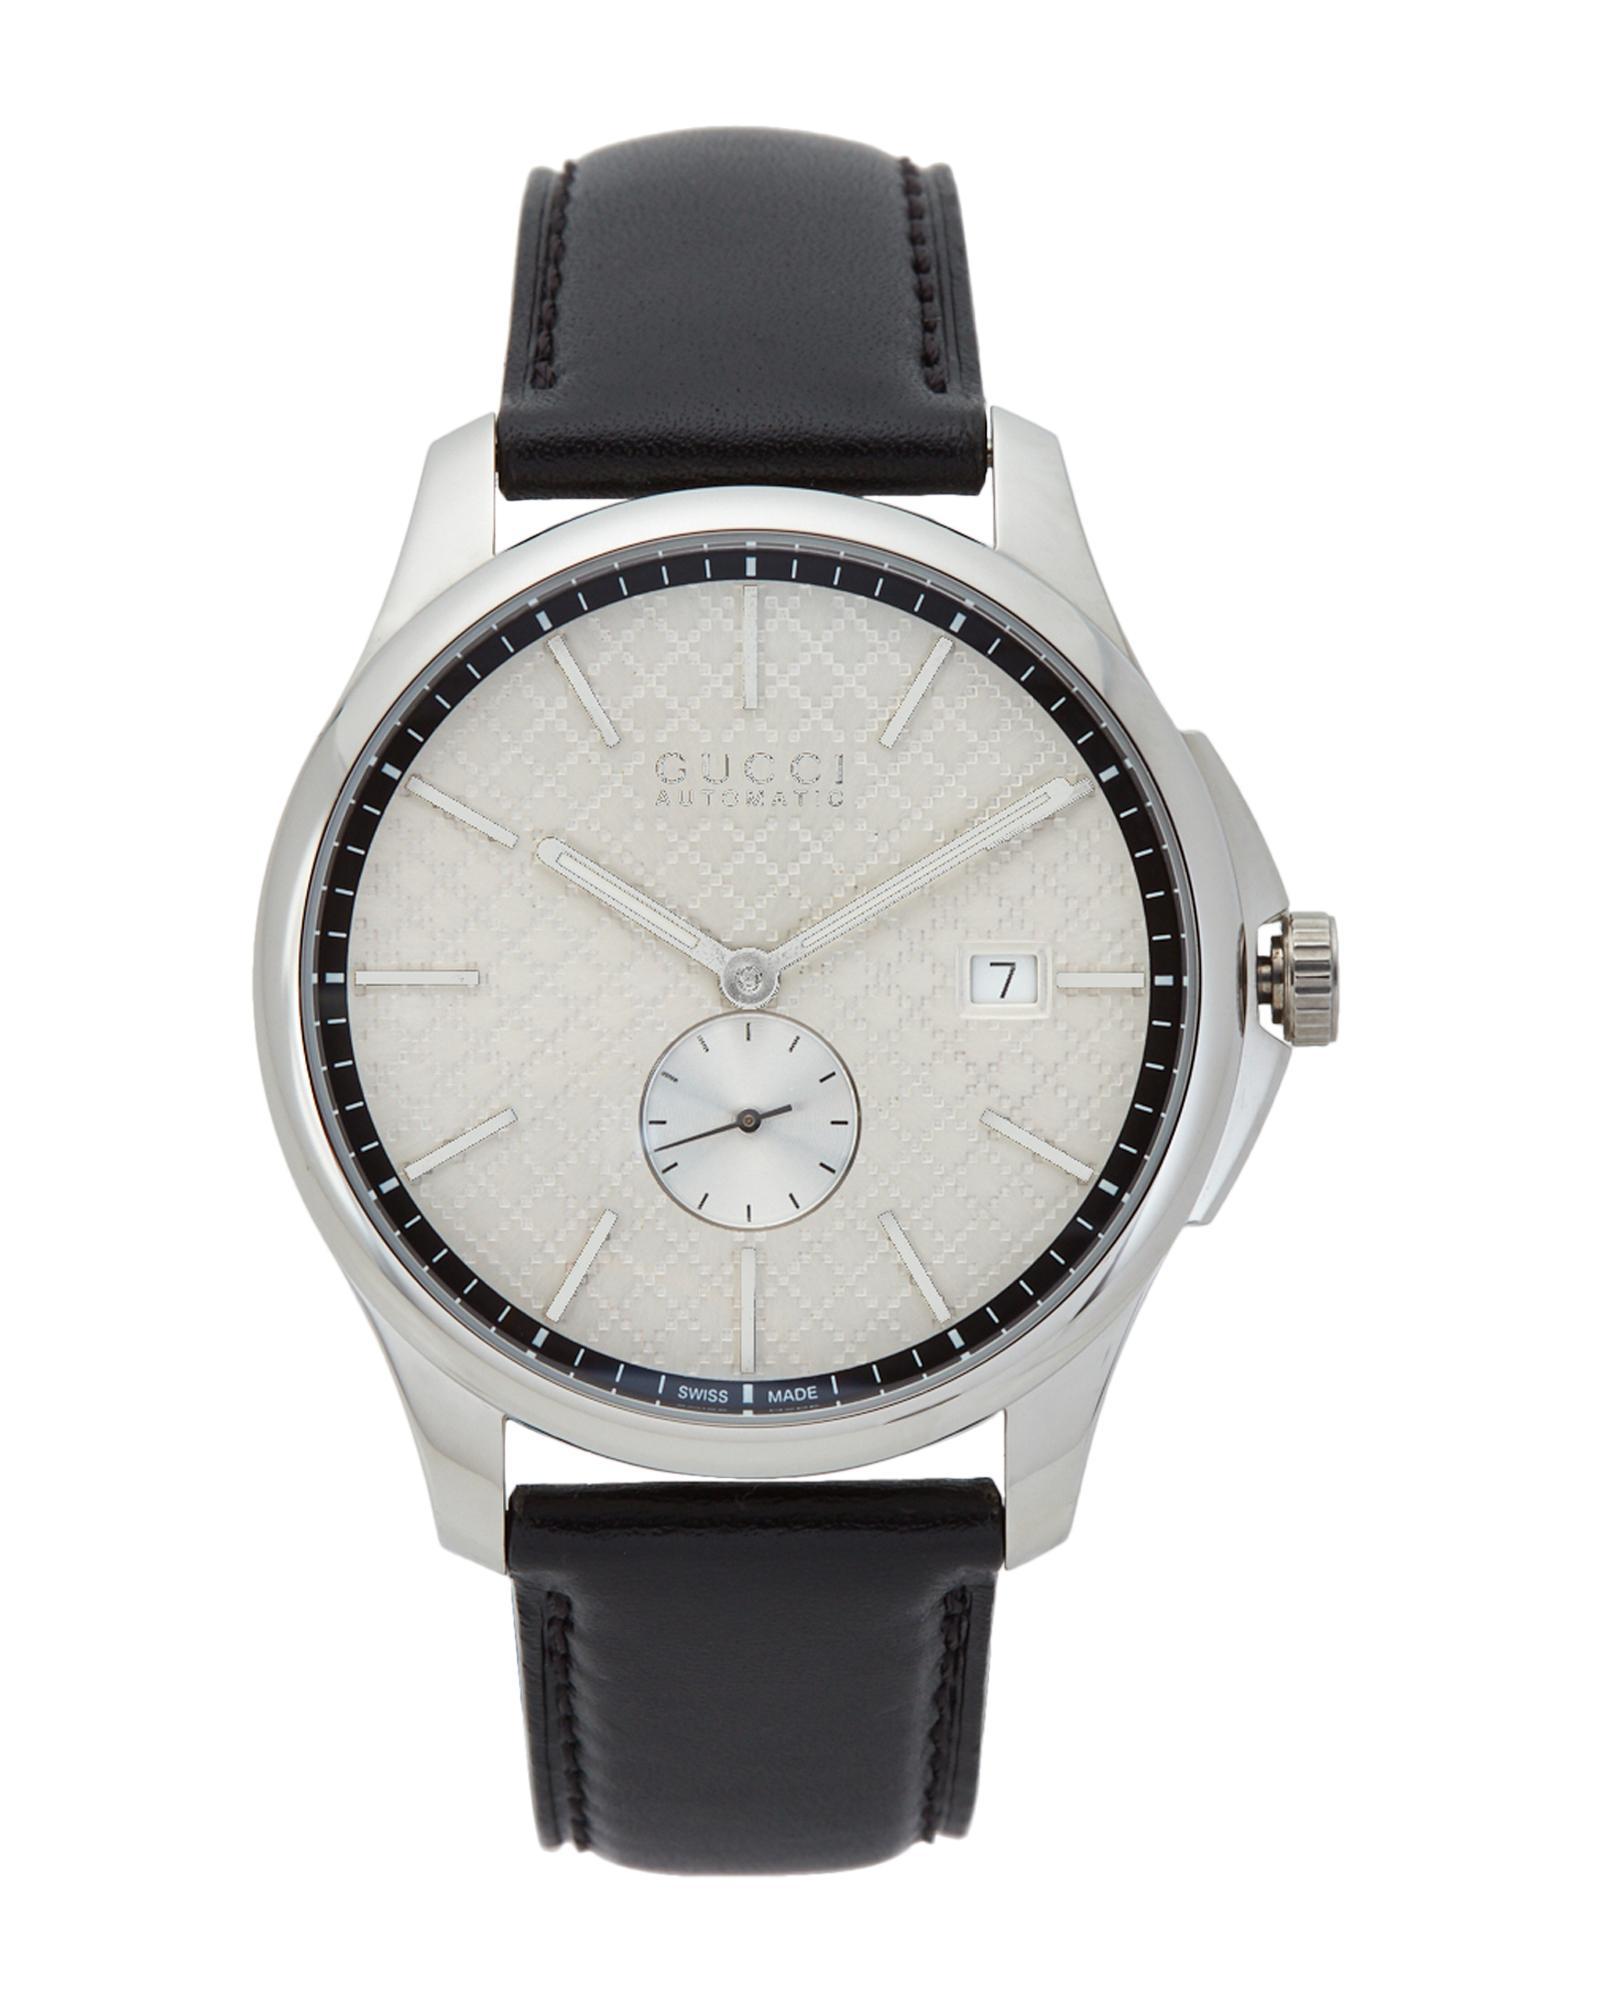 b7ed172d23a Lyst - Gucci Ya126313 Silver-tone   Black Watch in White for Men